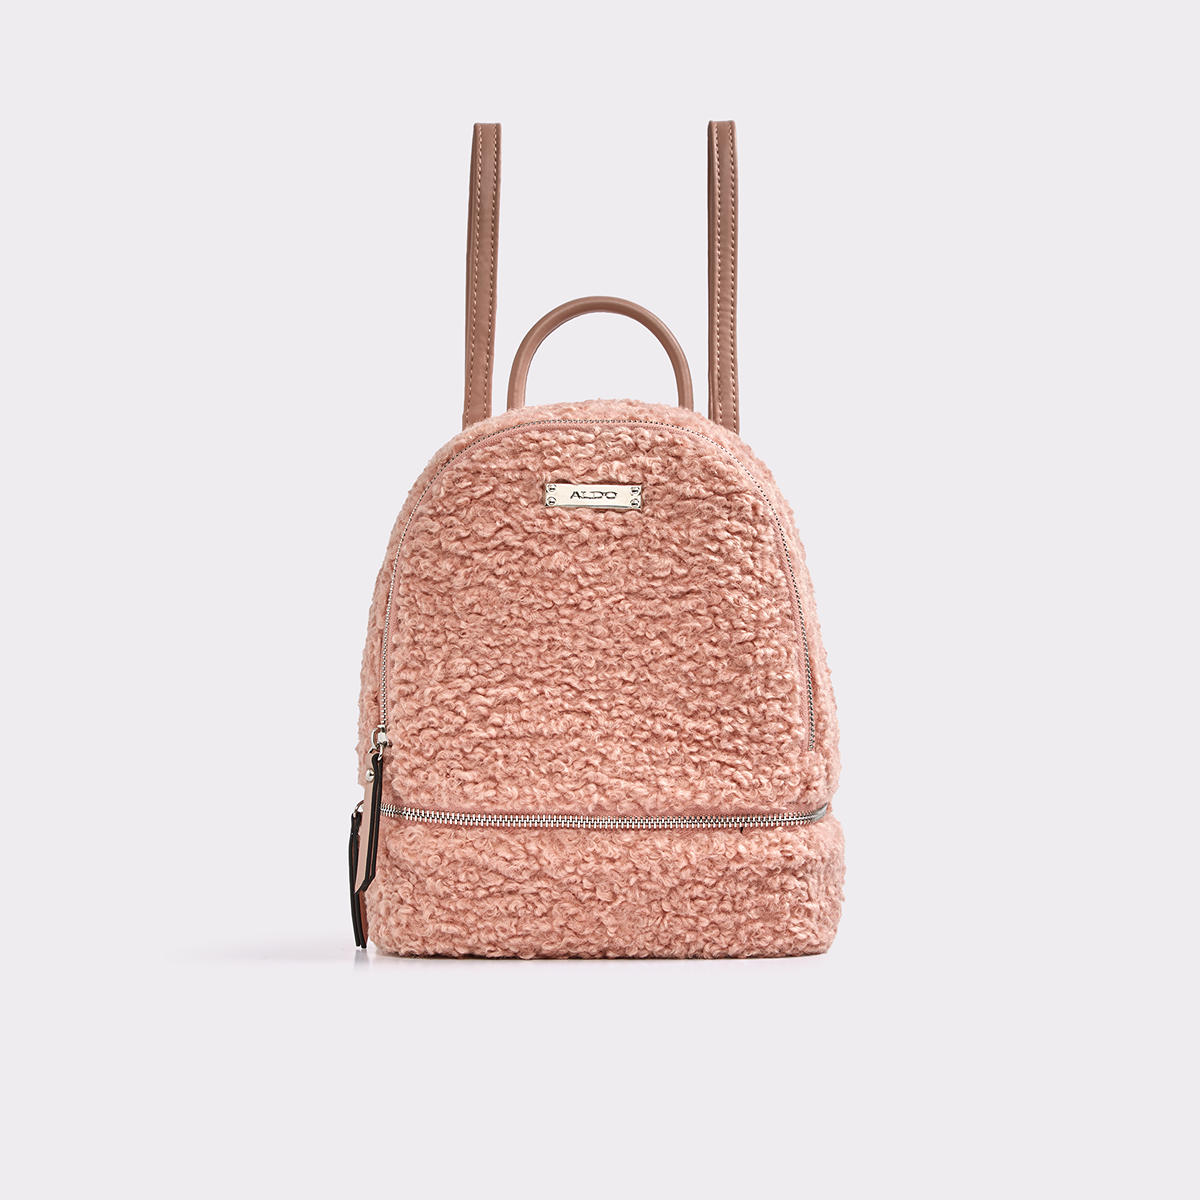 60679703155 Anacoedo Light Pink Women s Backpacks   duffles